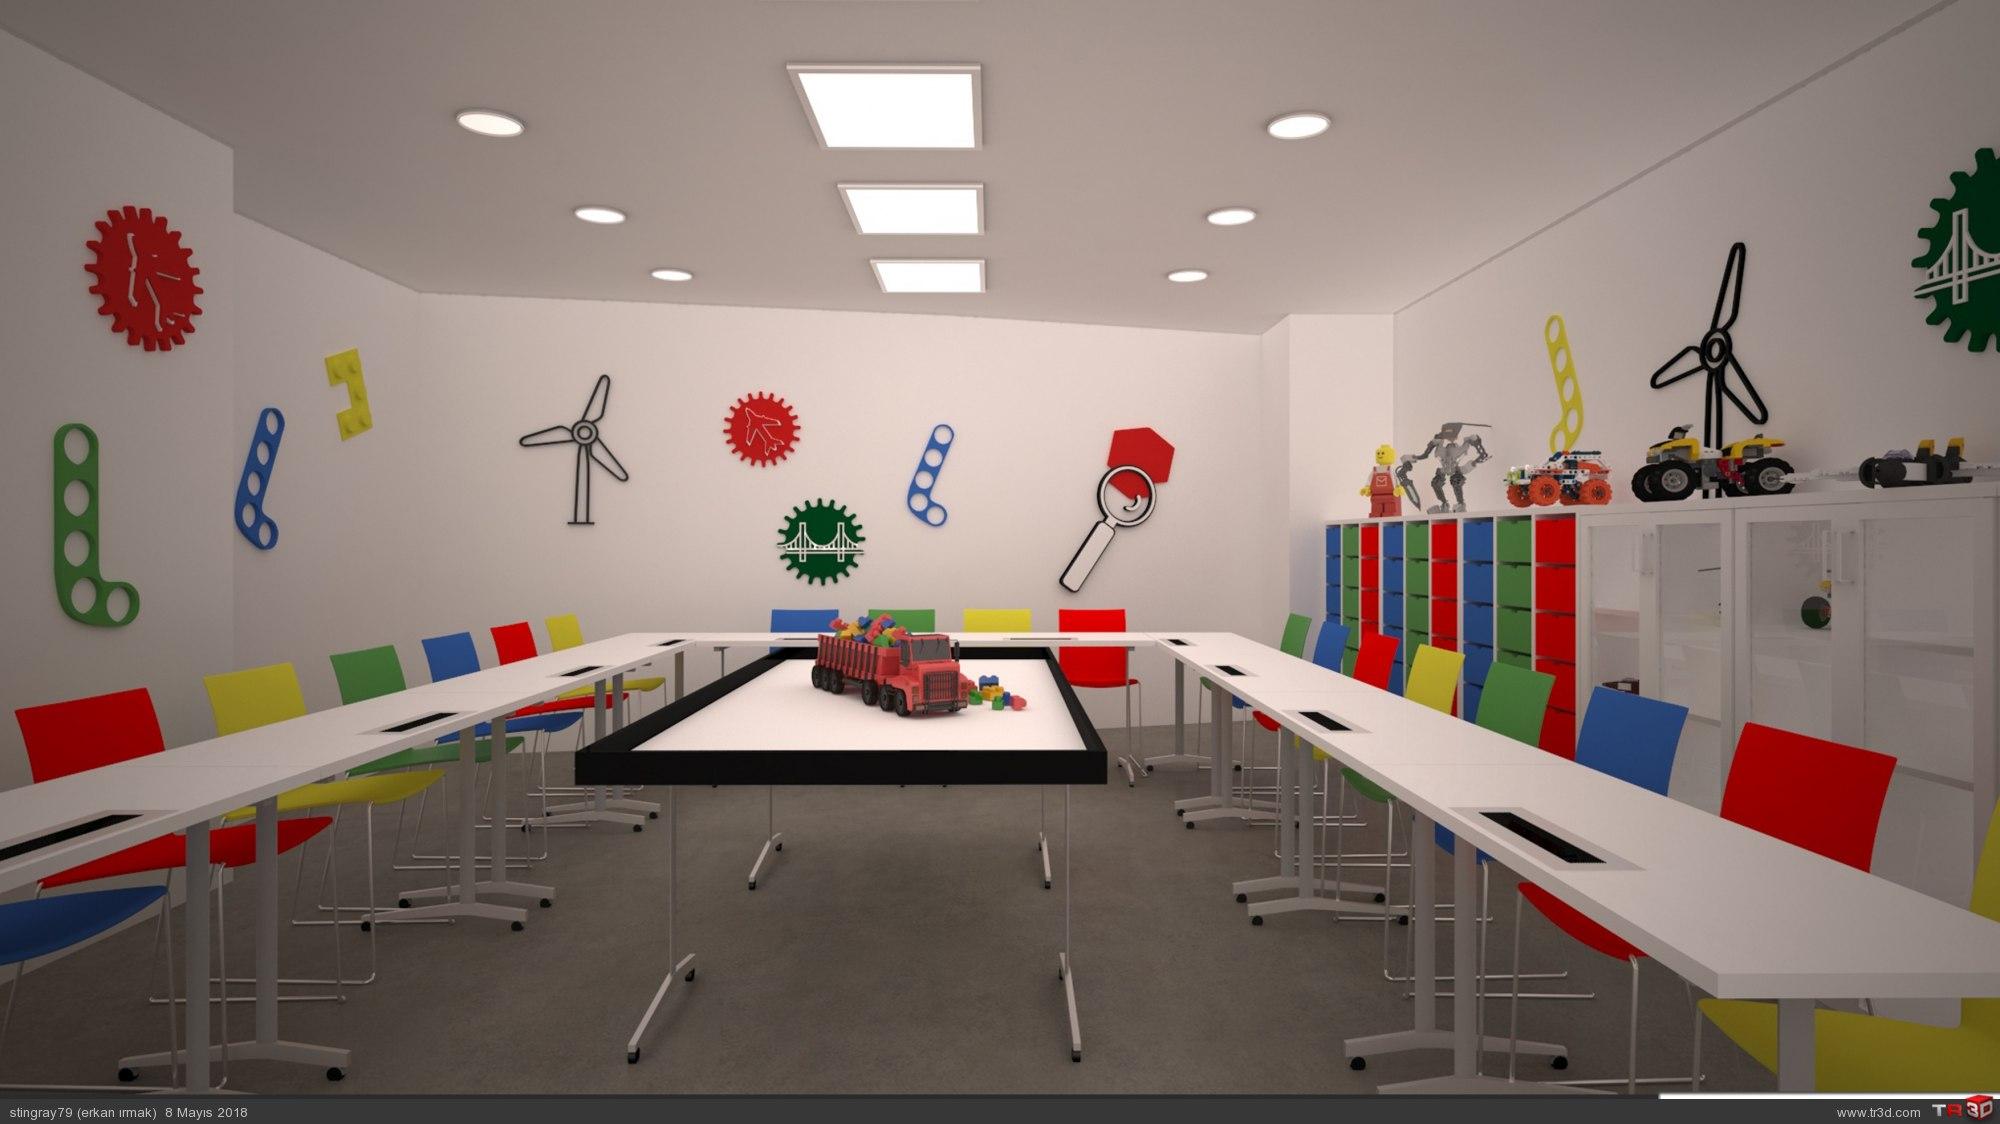 Lego oyun odası